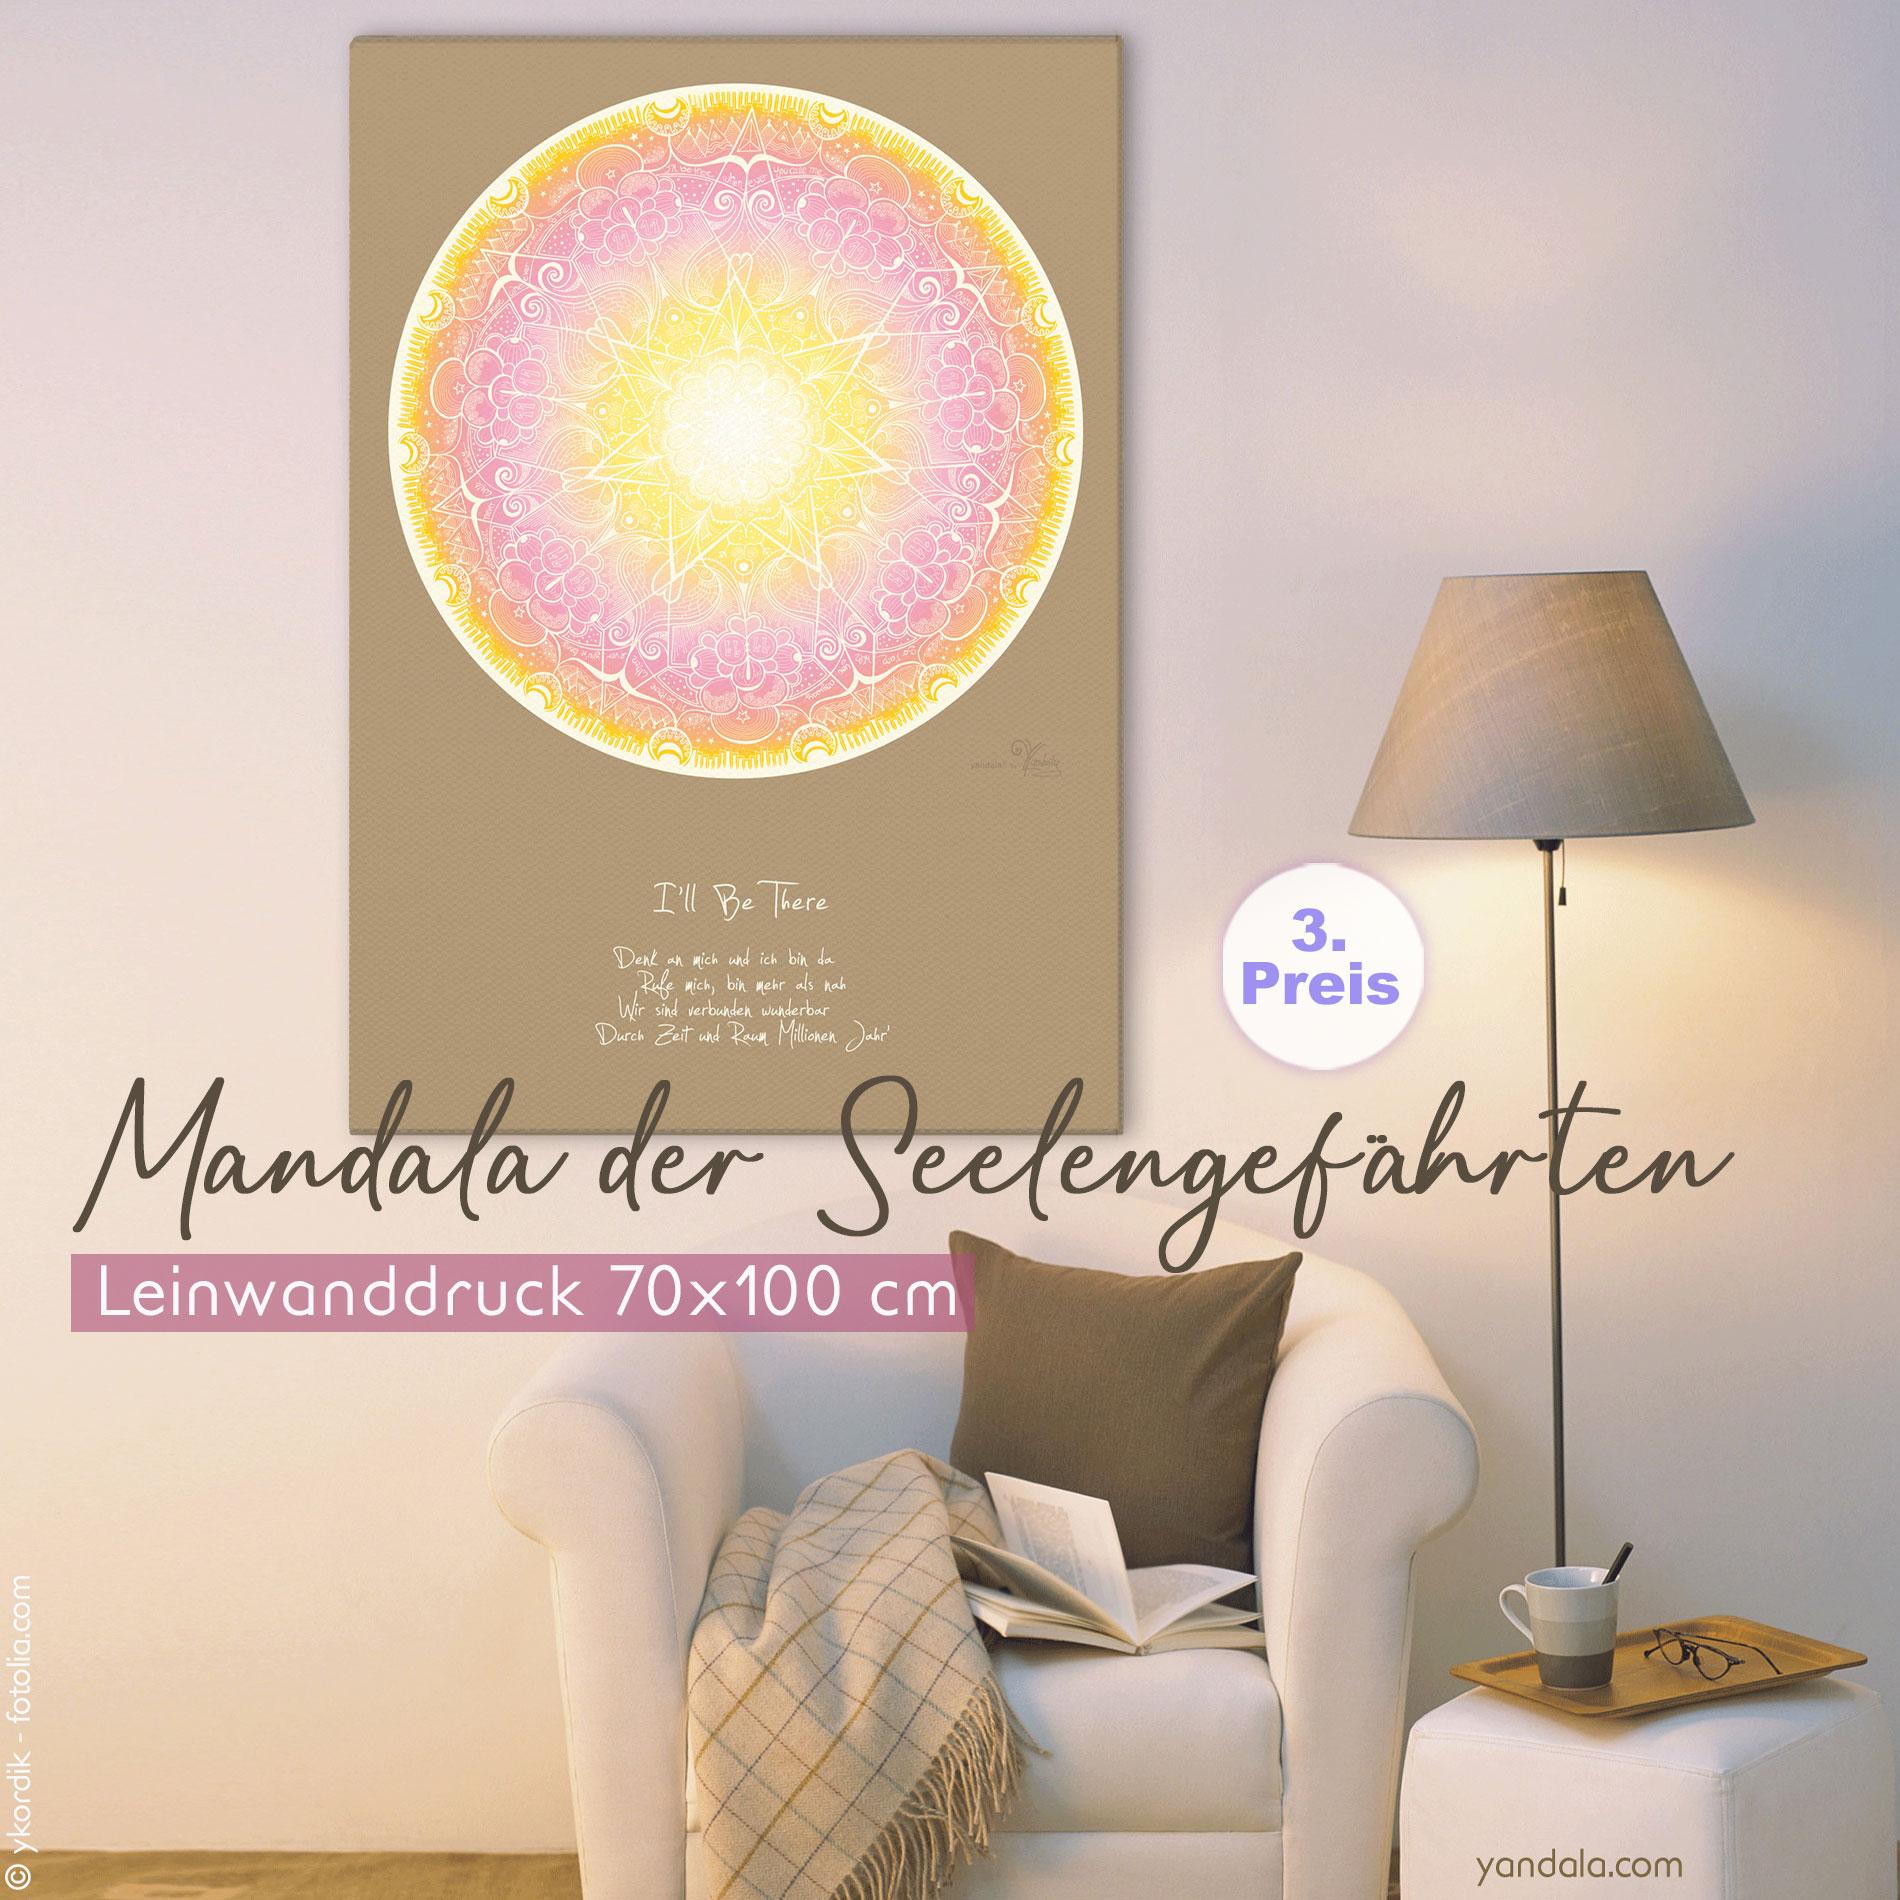 3.Preis-Leinwanddruck-IBT-70x100cm-yandala